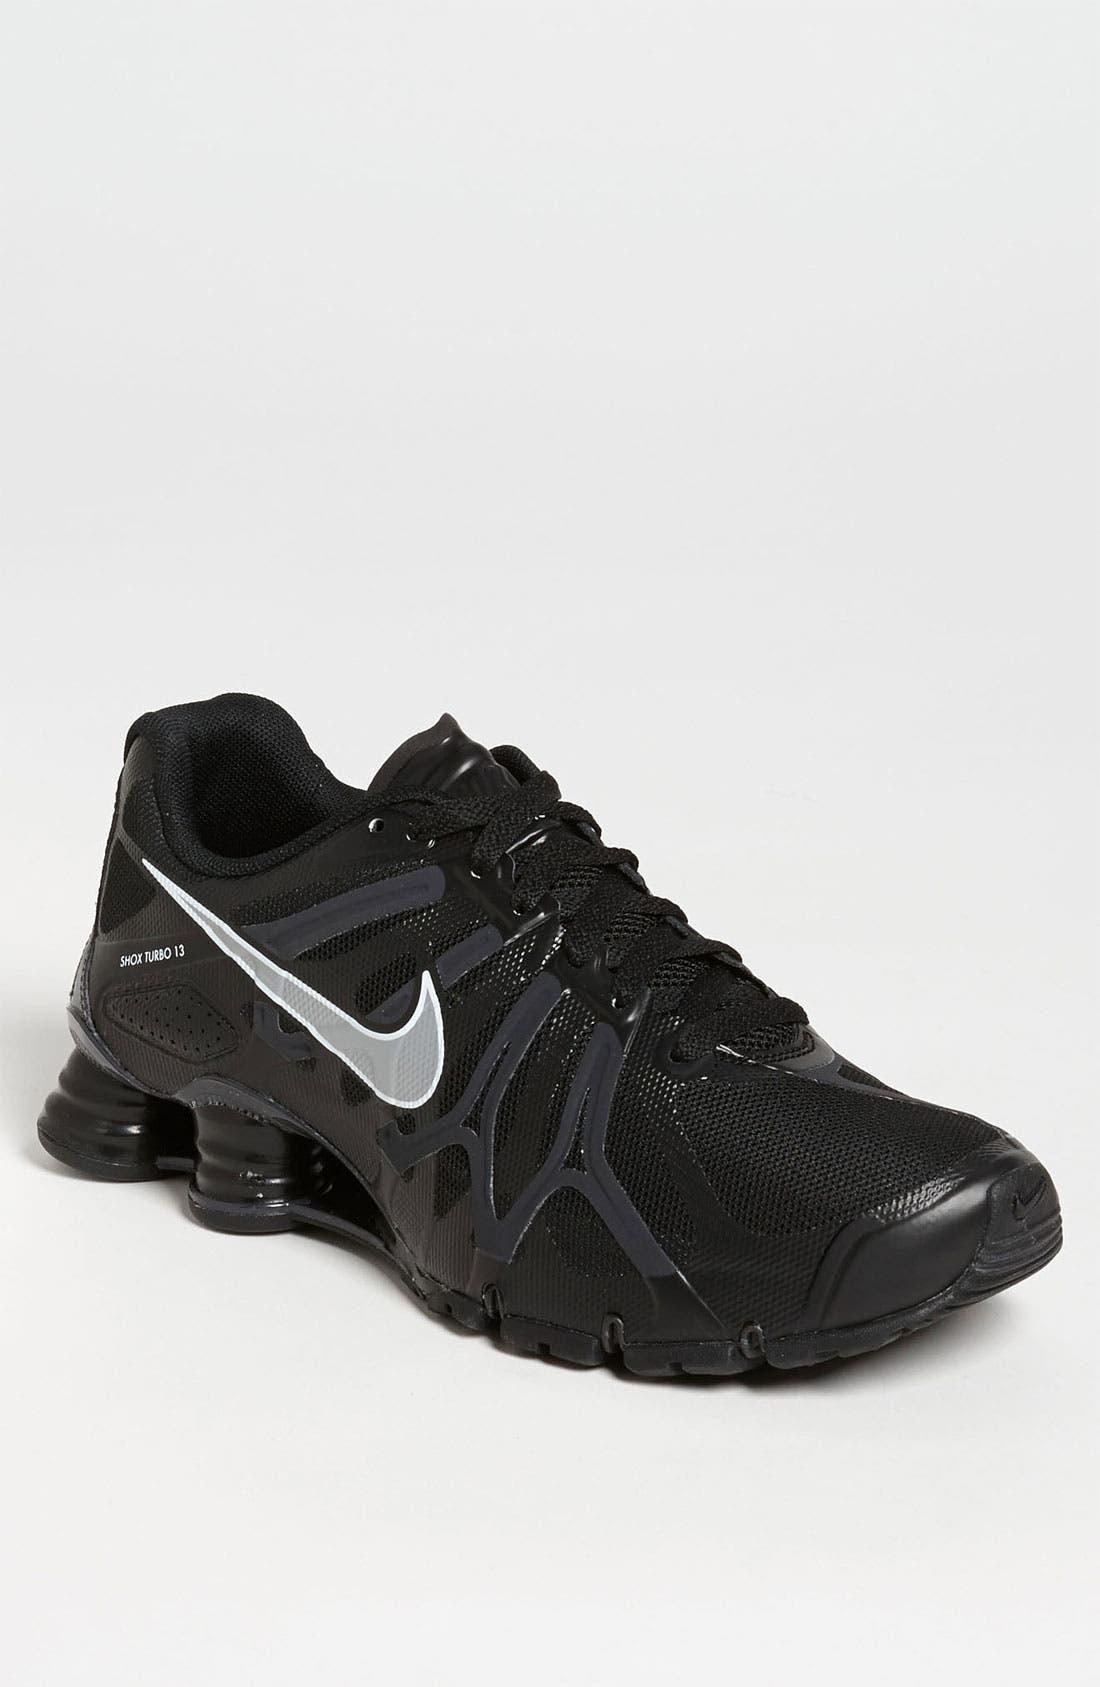 Alternate Image 1 Selected - Nike 'Shox Turbo+ 13' Running Shoe (Men)